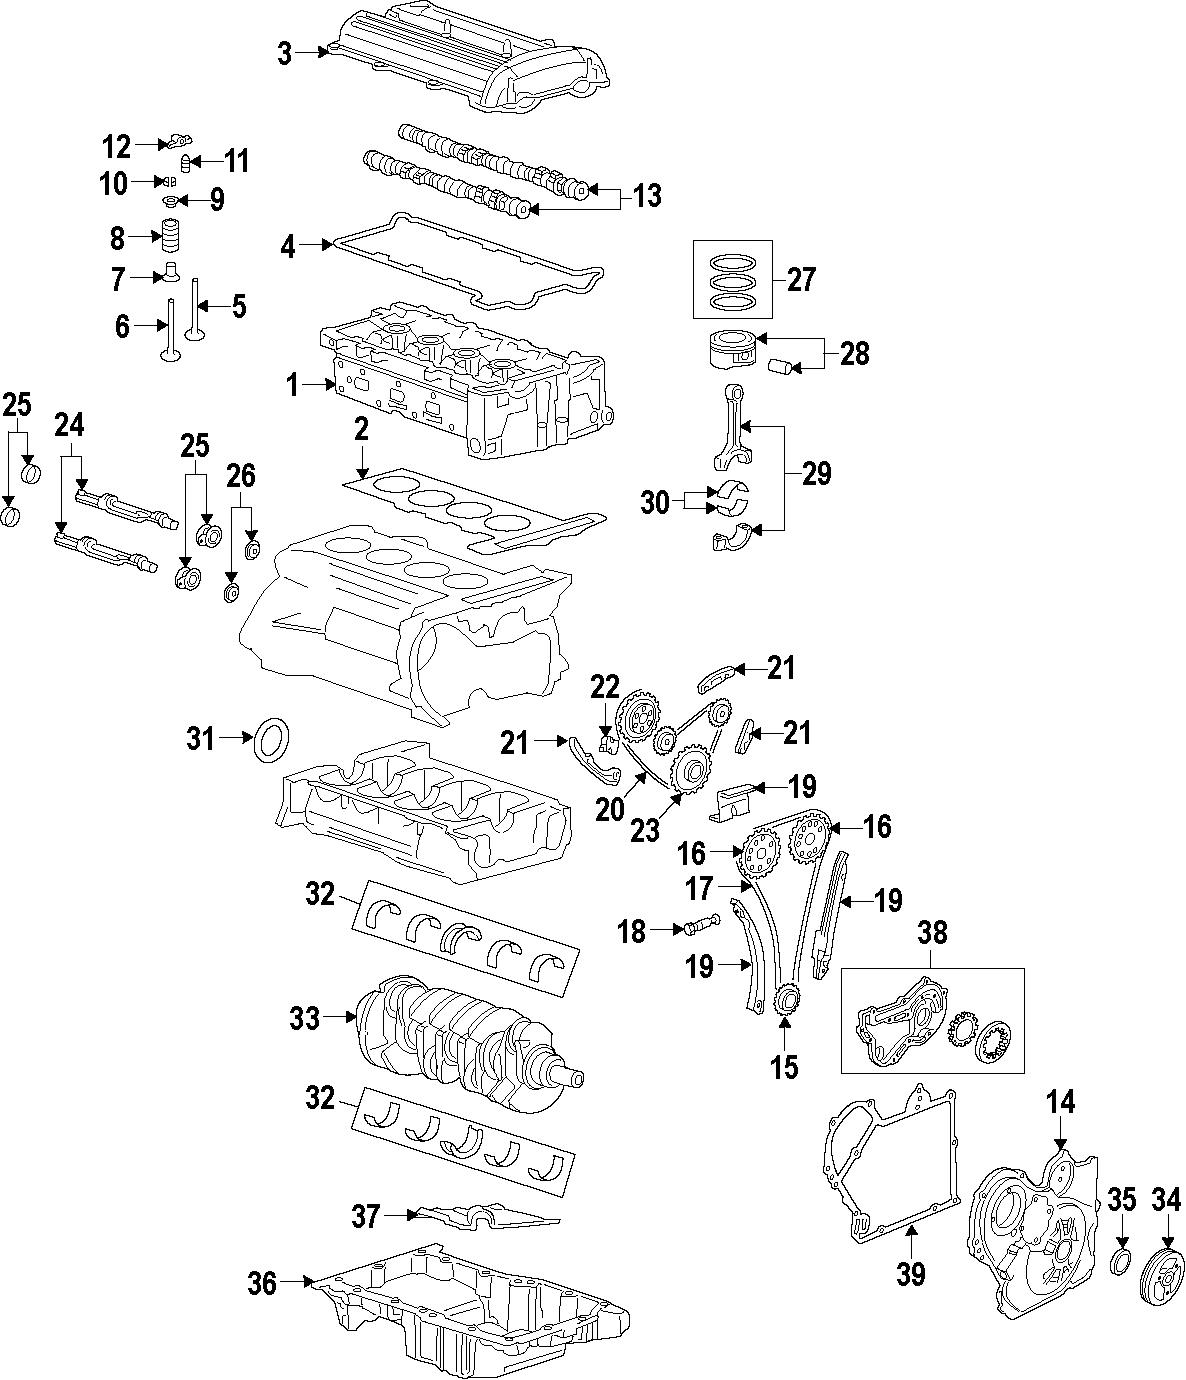 2014 Buick Verano Camshaft  Timing  Engine  Actuator